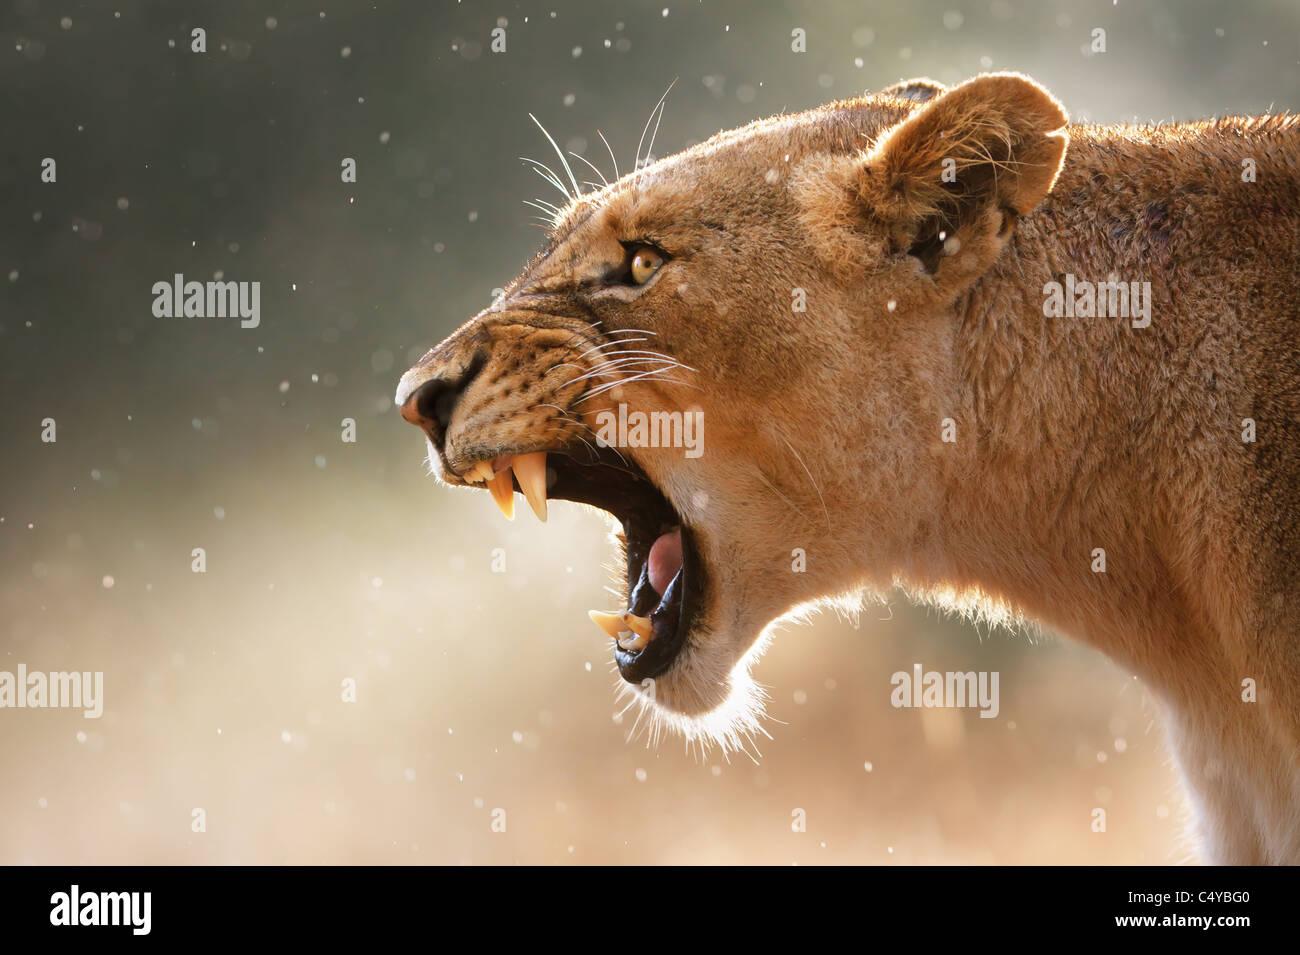 Lioness displays dangerous teeth during light rainstorm - Kruger National Park - South Africa Stock Foto